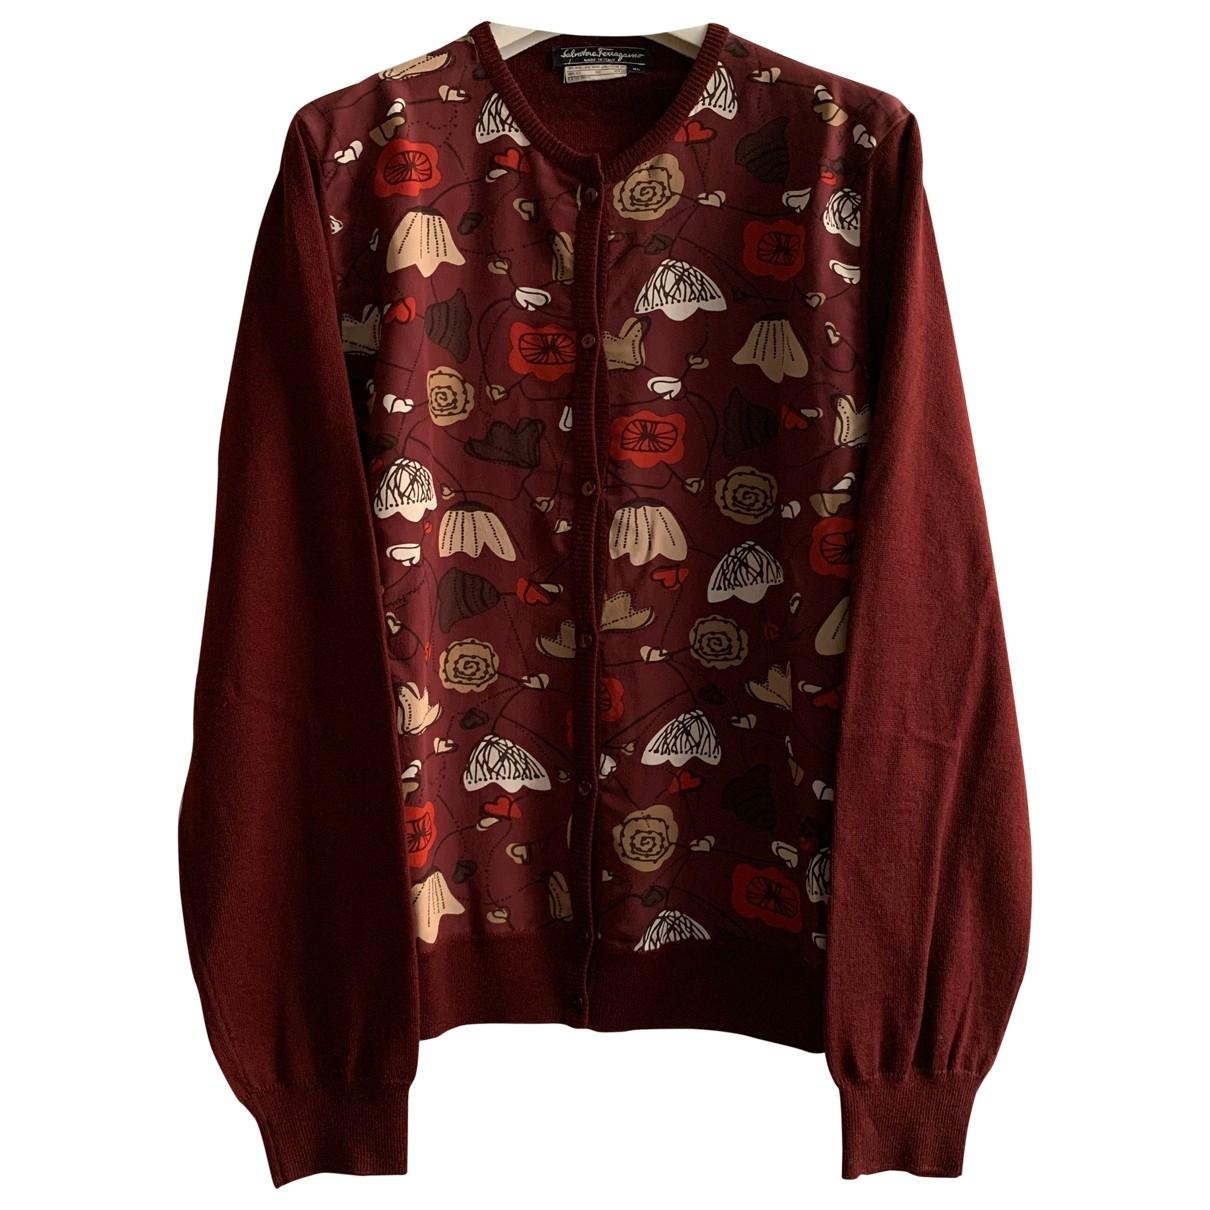 Salvatore Ferragamo \N Burgundy Wool Knitwear for Women XL International